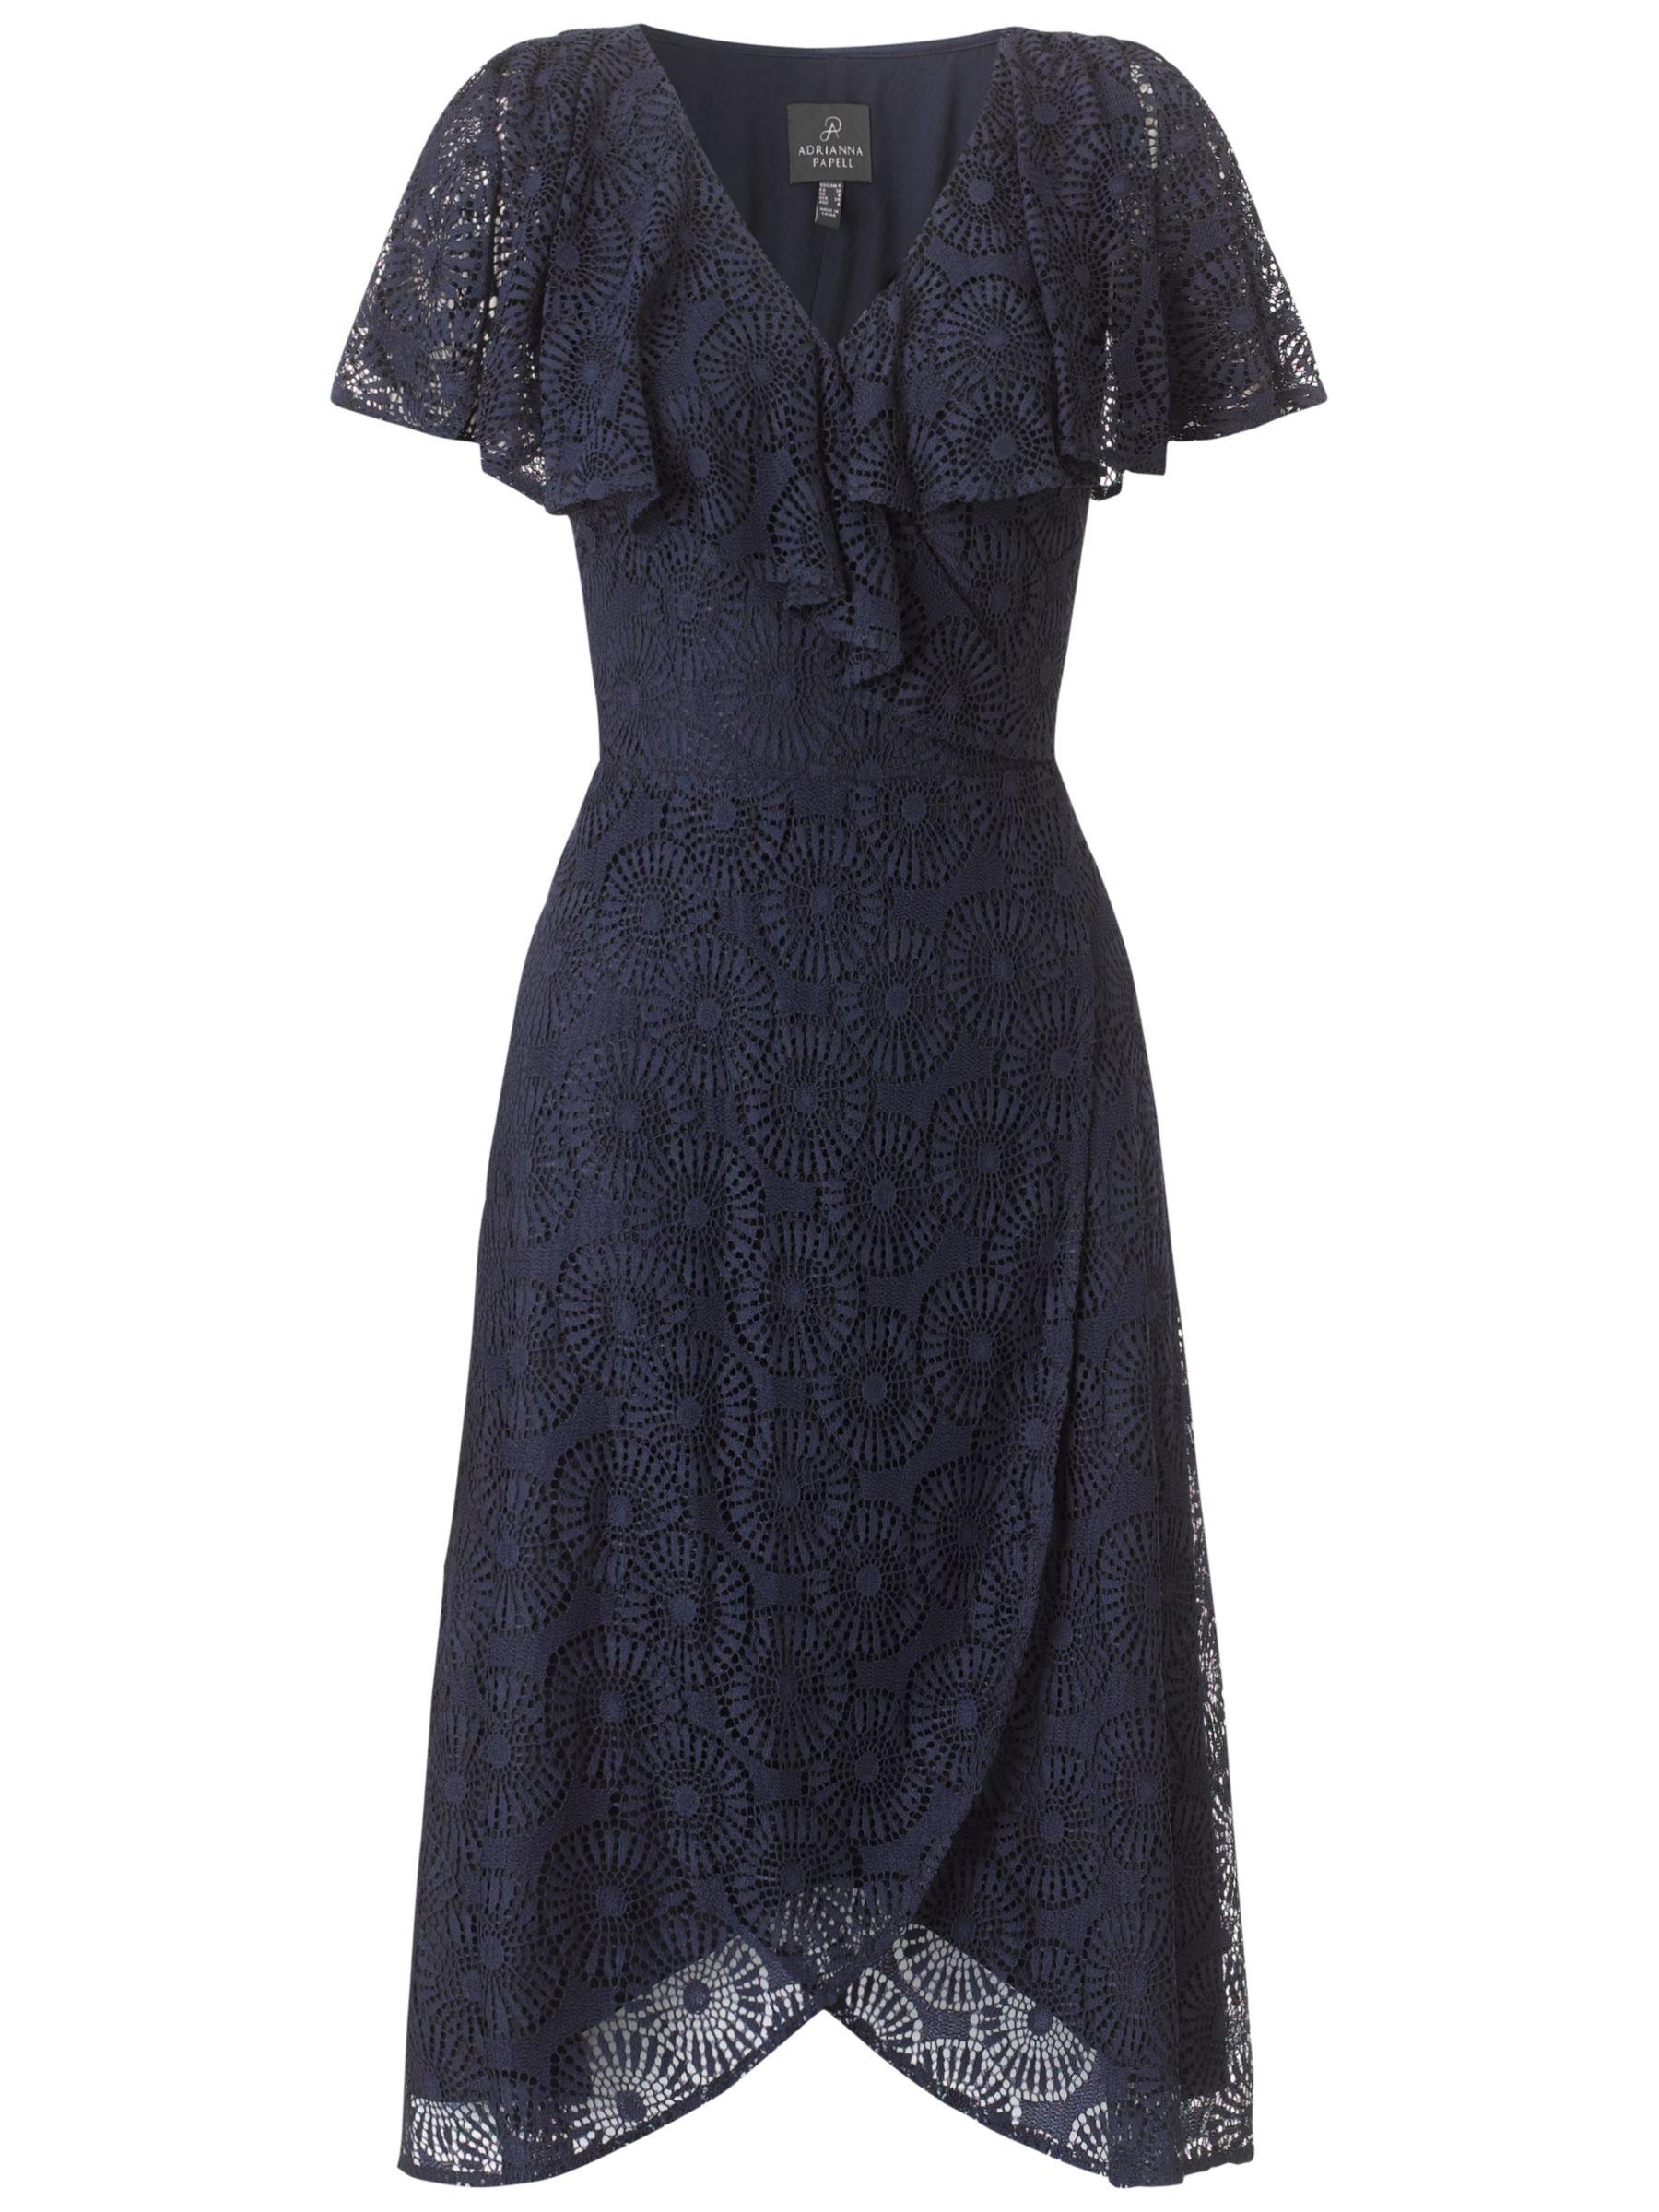 Adrianna Papell Crochet Dress, Navy